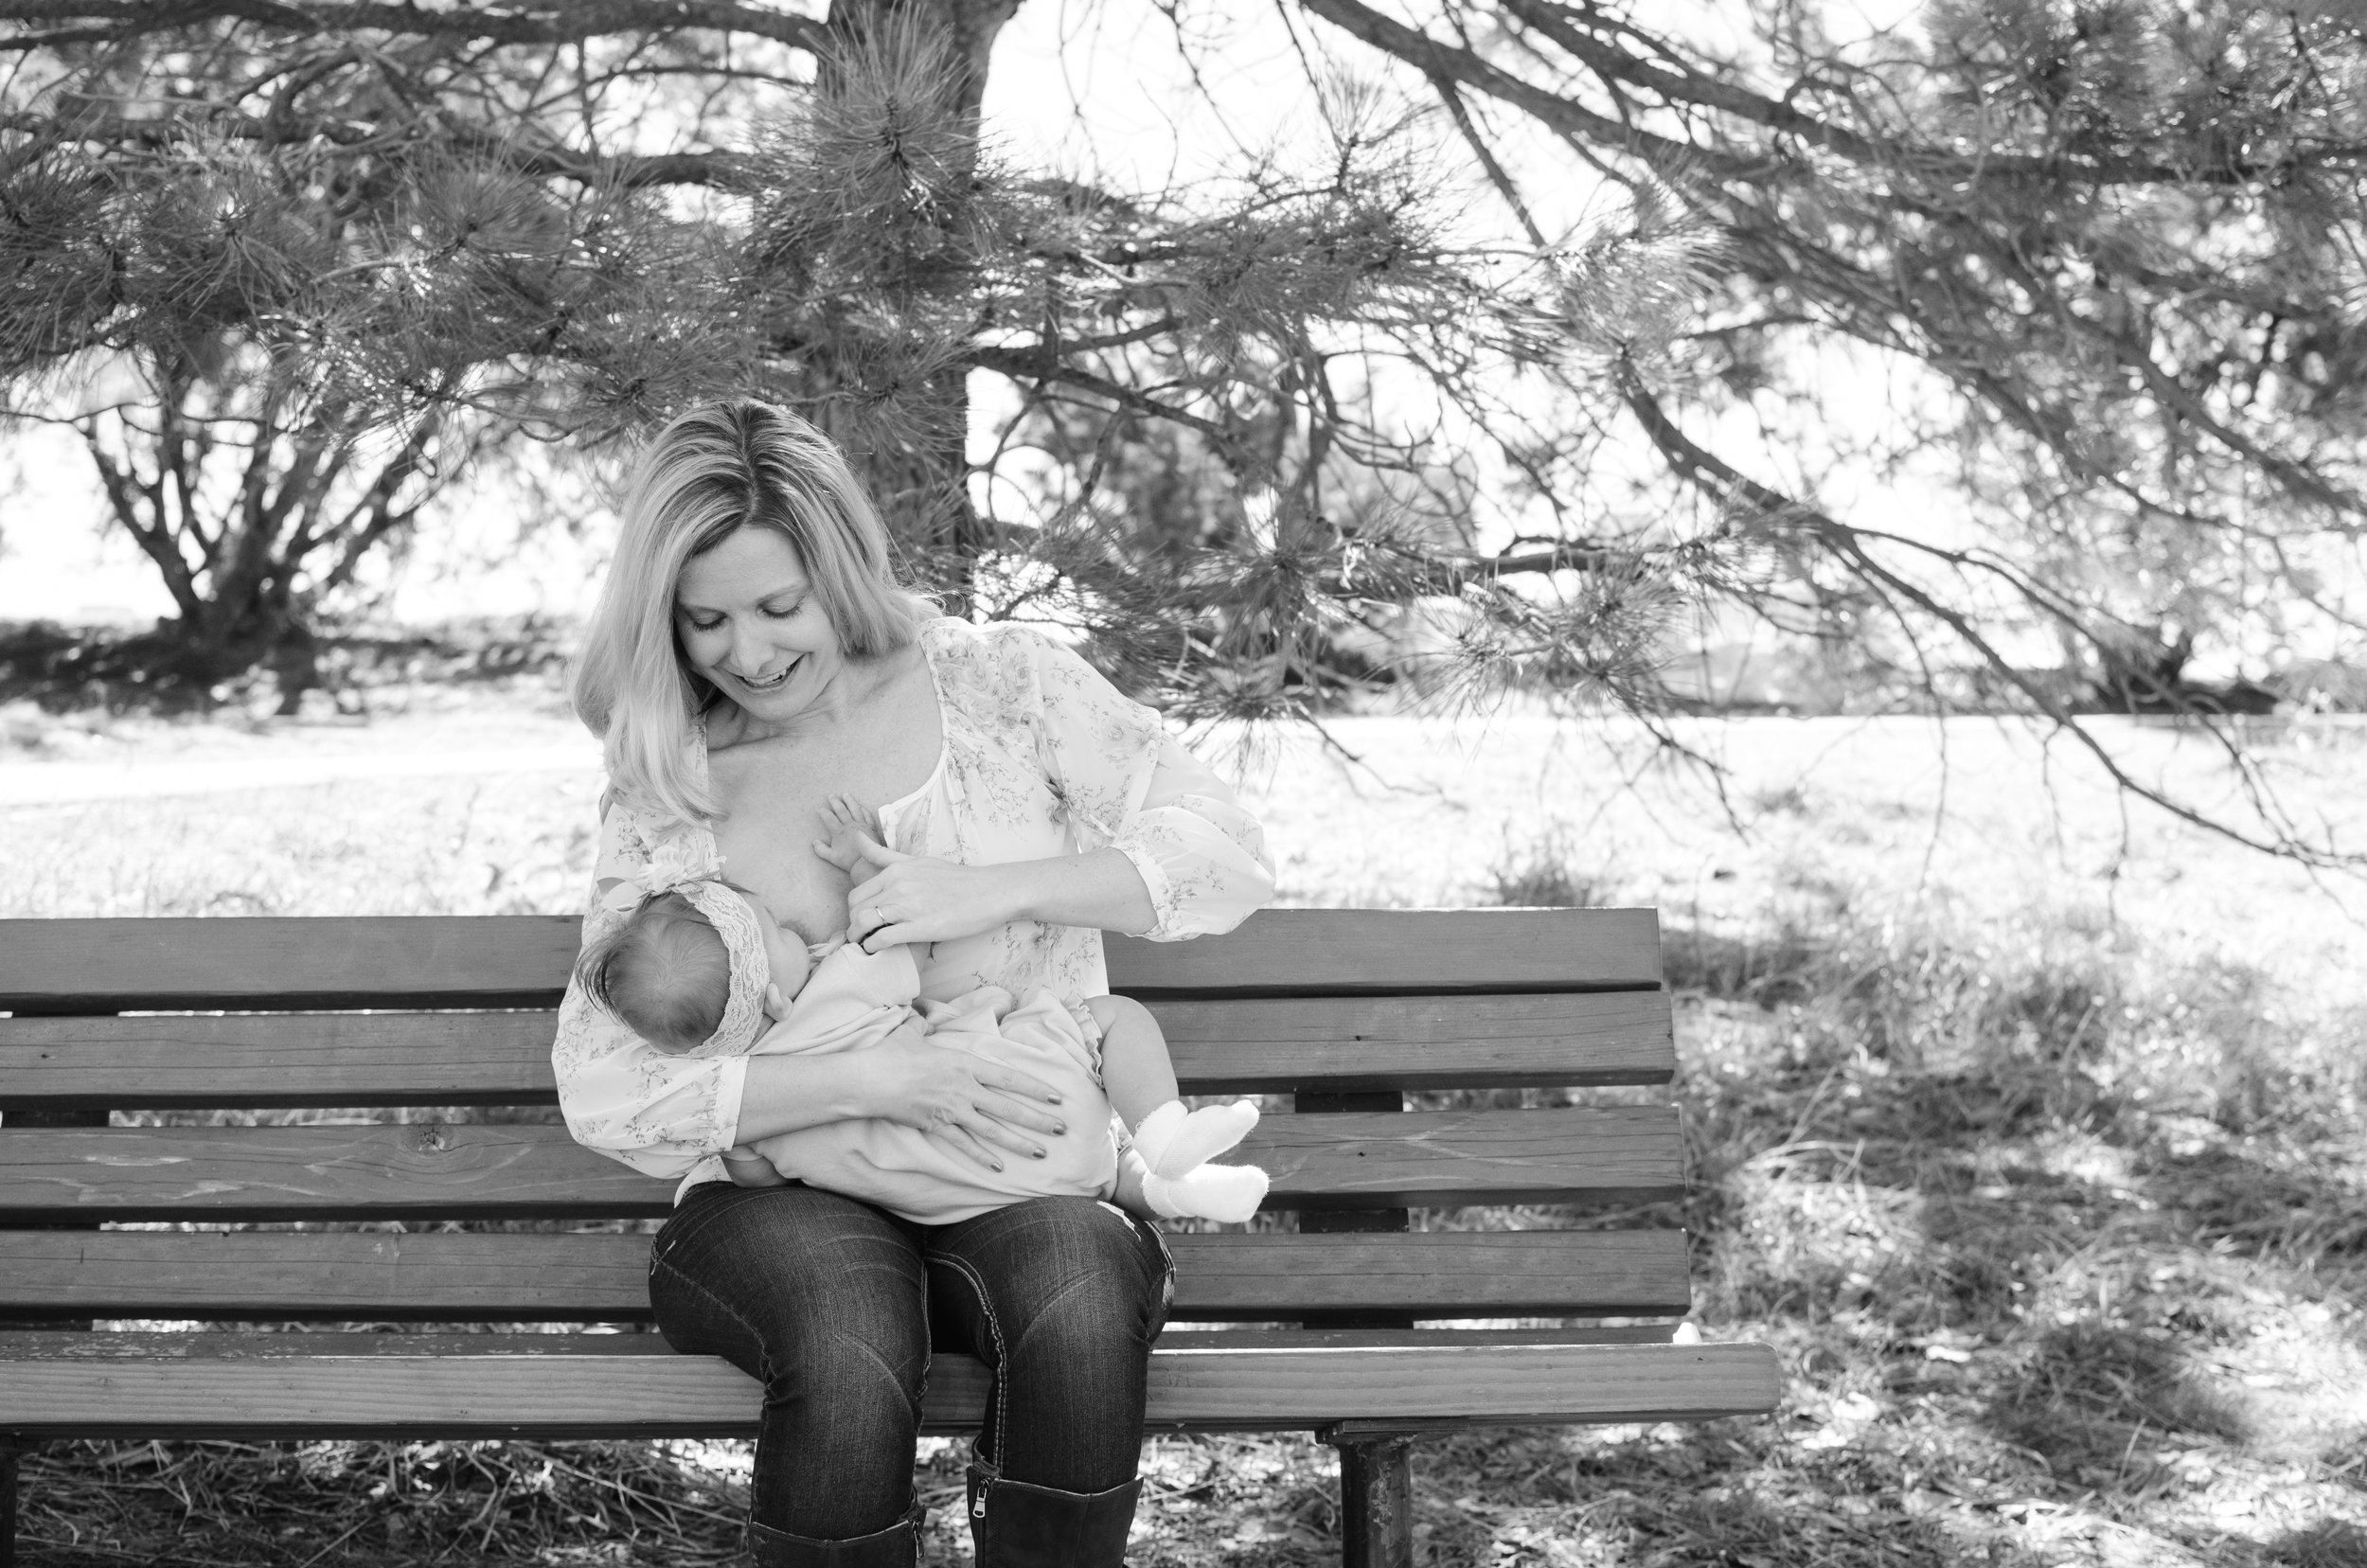 Breastfeeding on a bench, breastfeeding advice, normalize breastfeeding